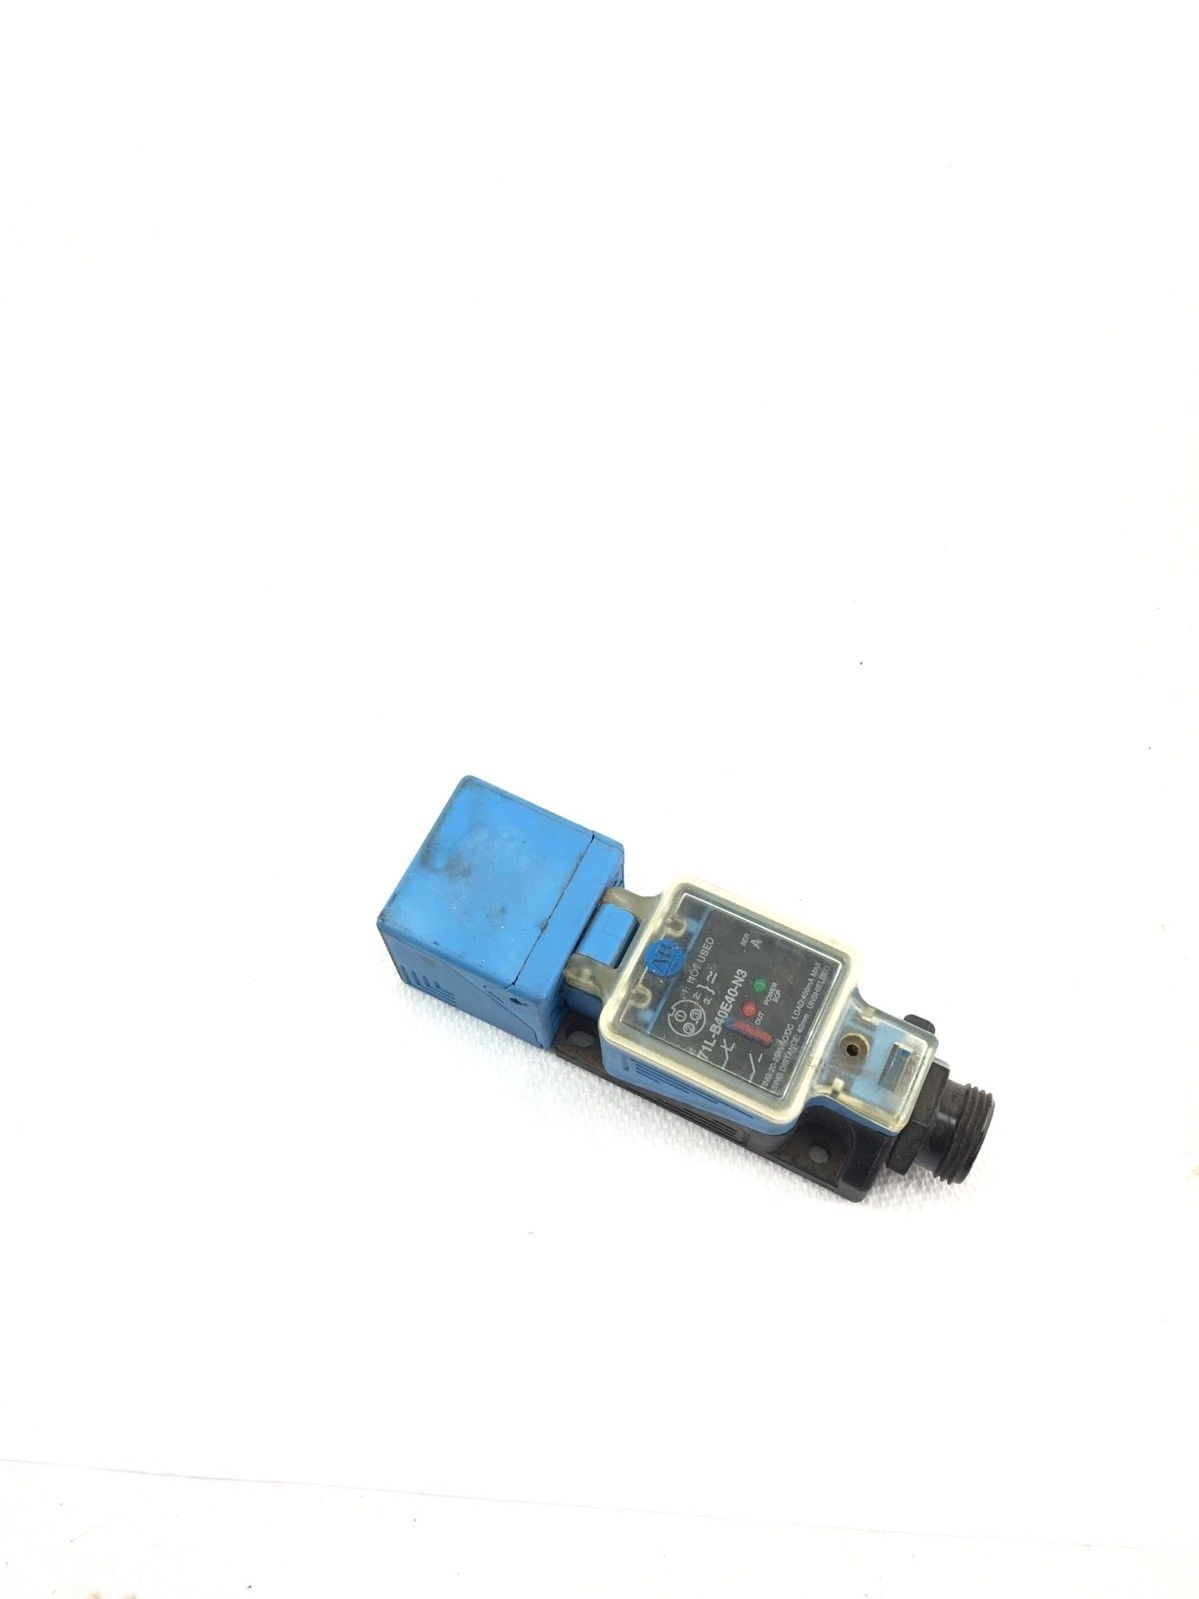 USED ALLEN BRADLEY 871L-B40E40-N3 SERIES A INDUCTIVE PROXIMITY SENSOR, (A594) 1